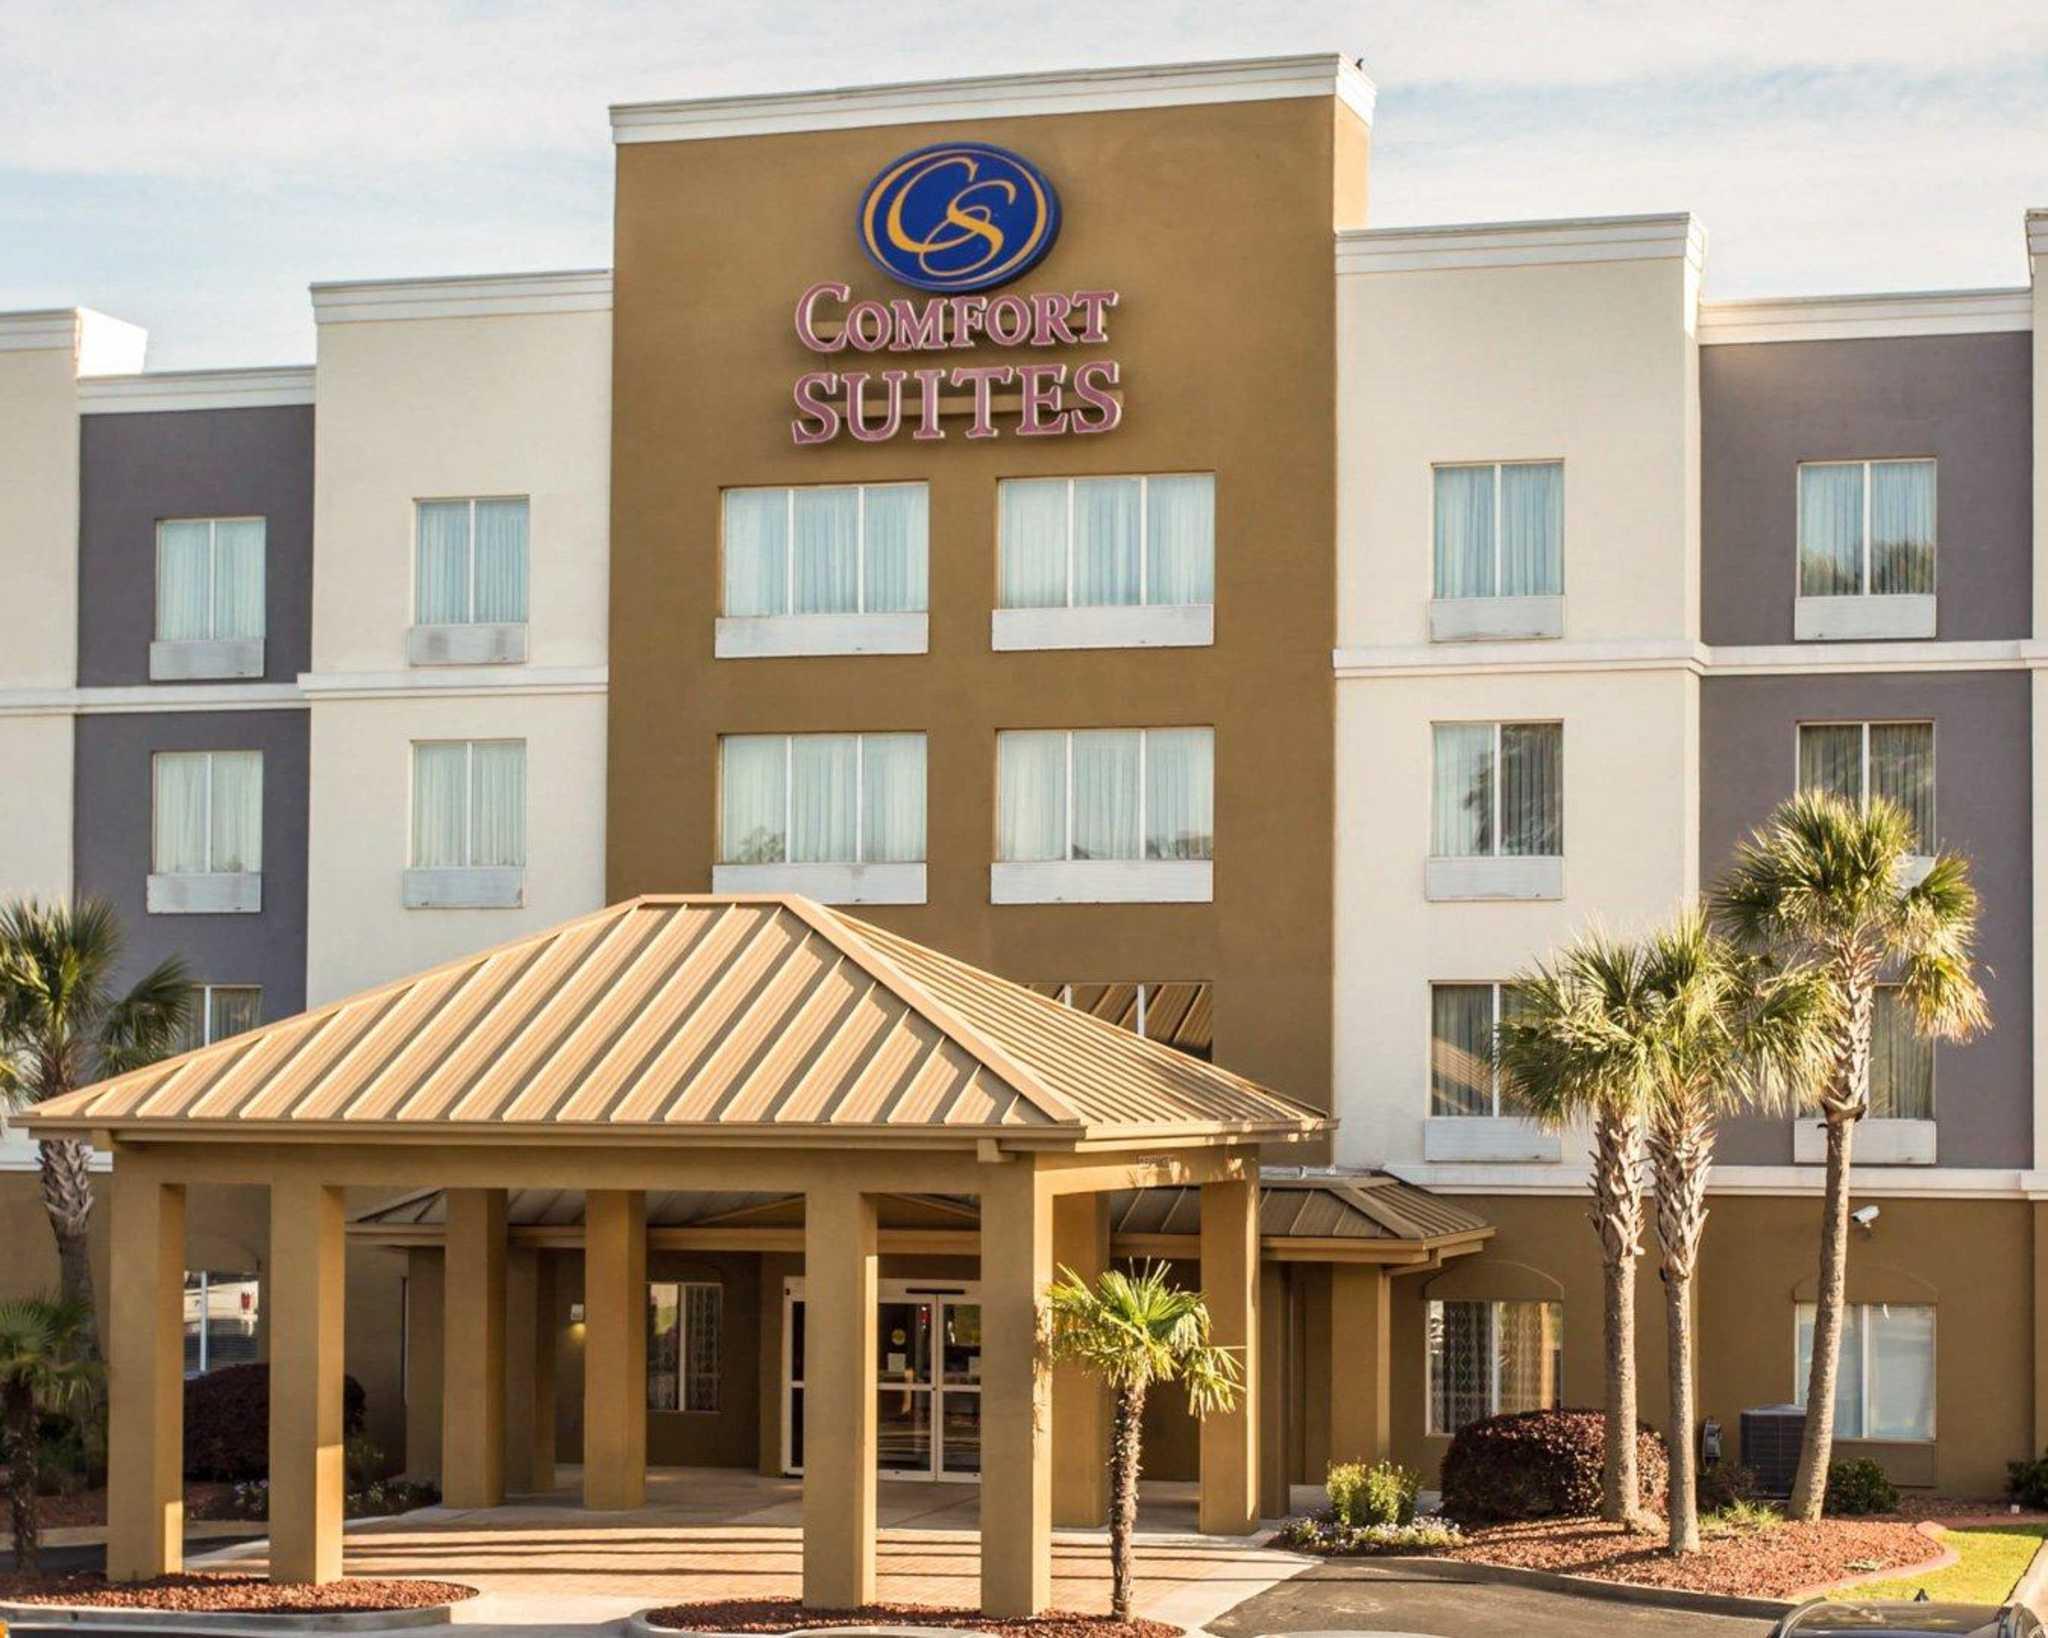 Comfort Suites At Harbison Columbia South Carolina Sc